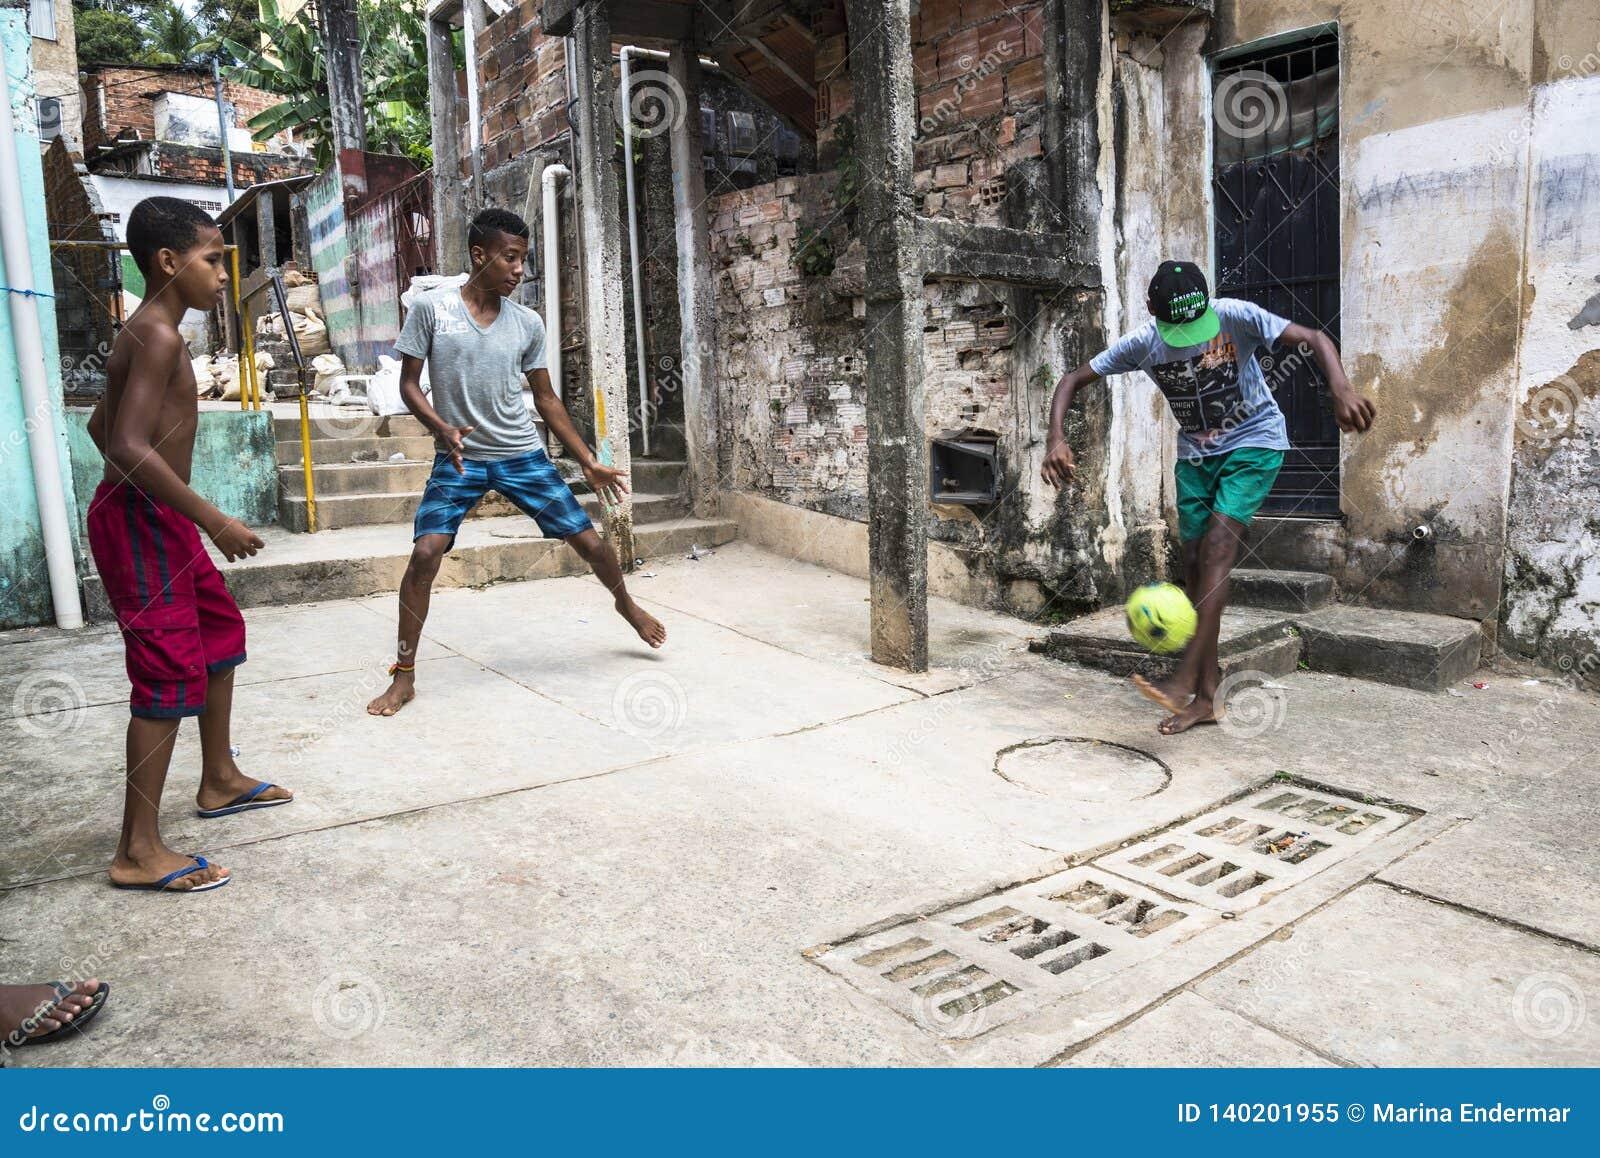 Мальчики играя футбол, Сальвадор, Бахю, Бразилию